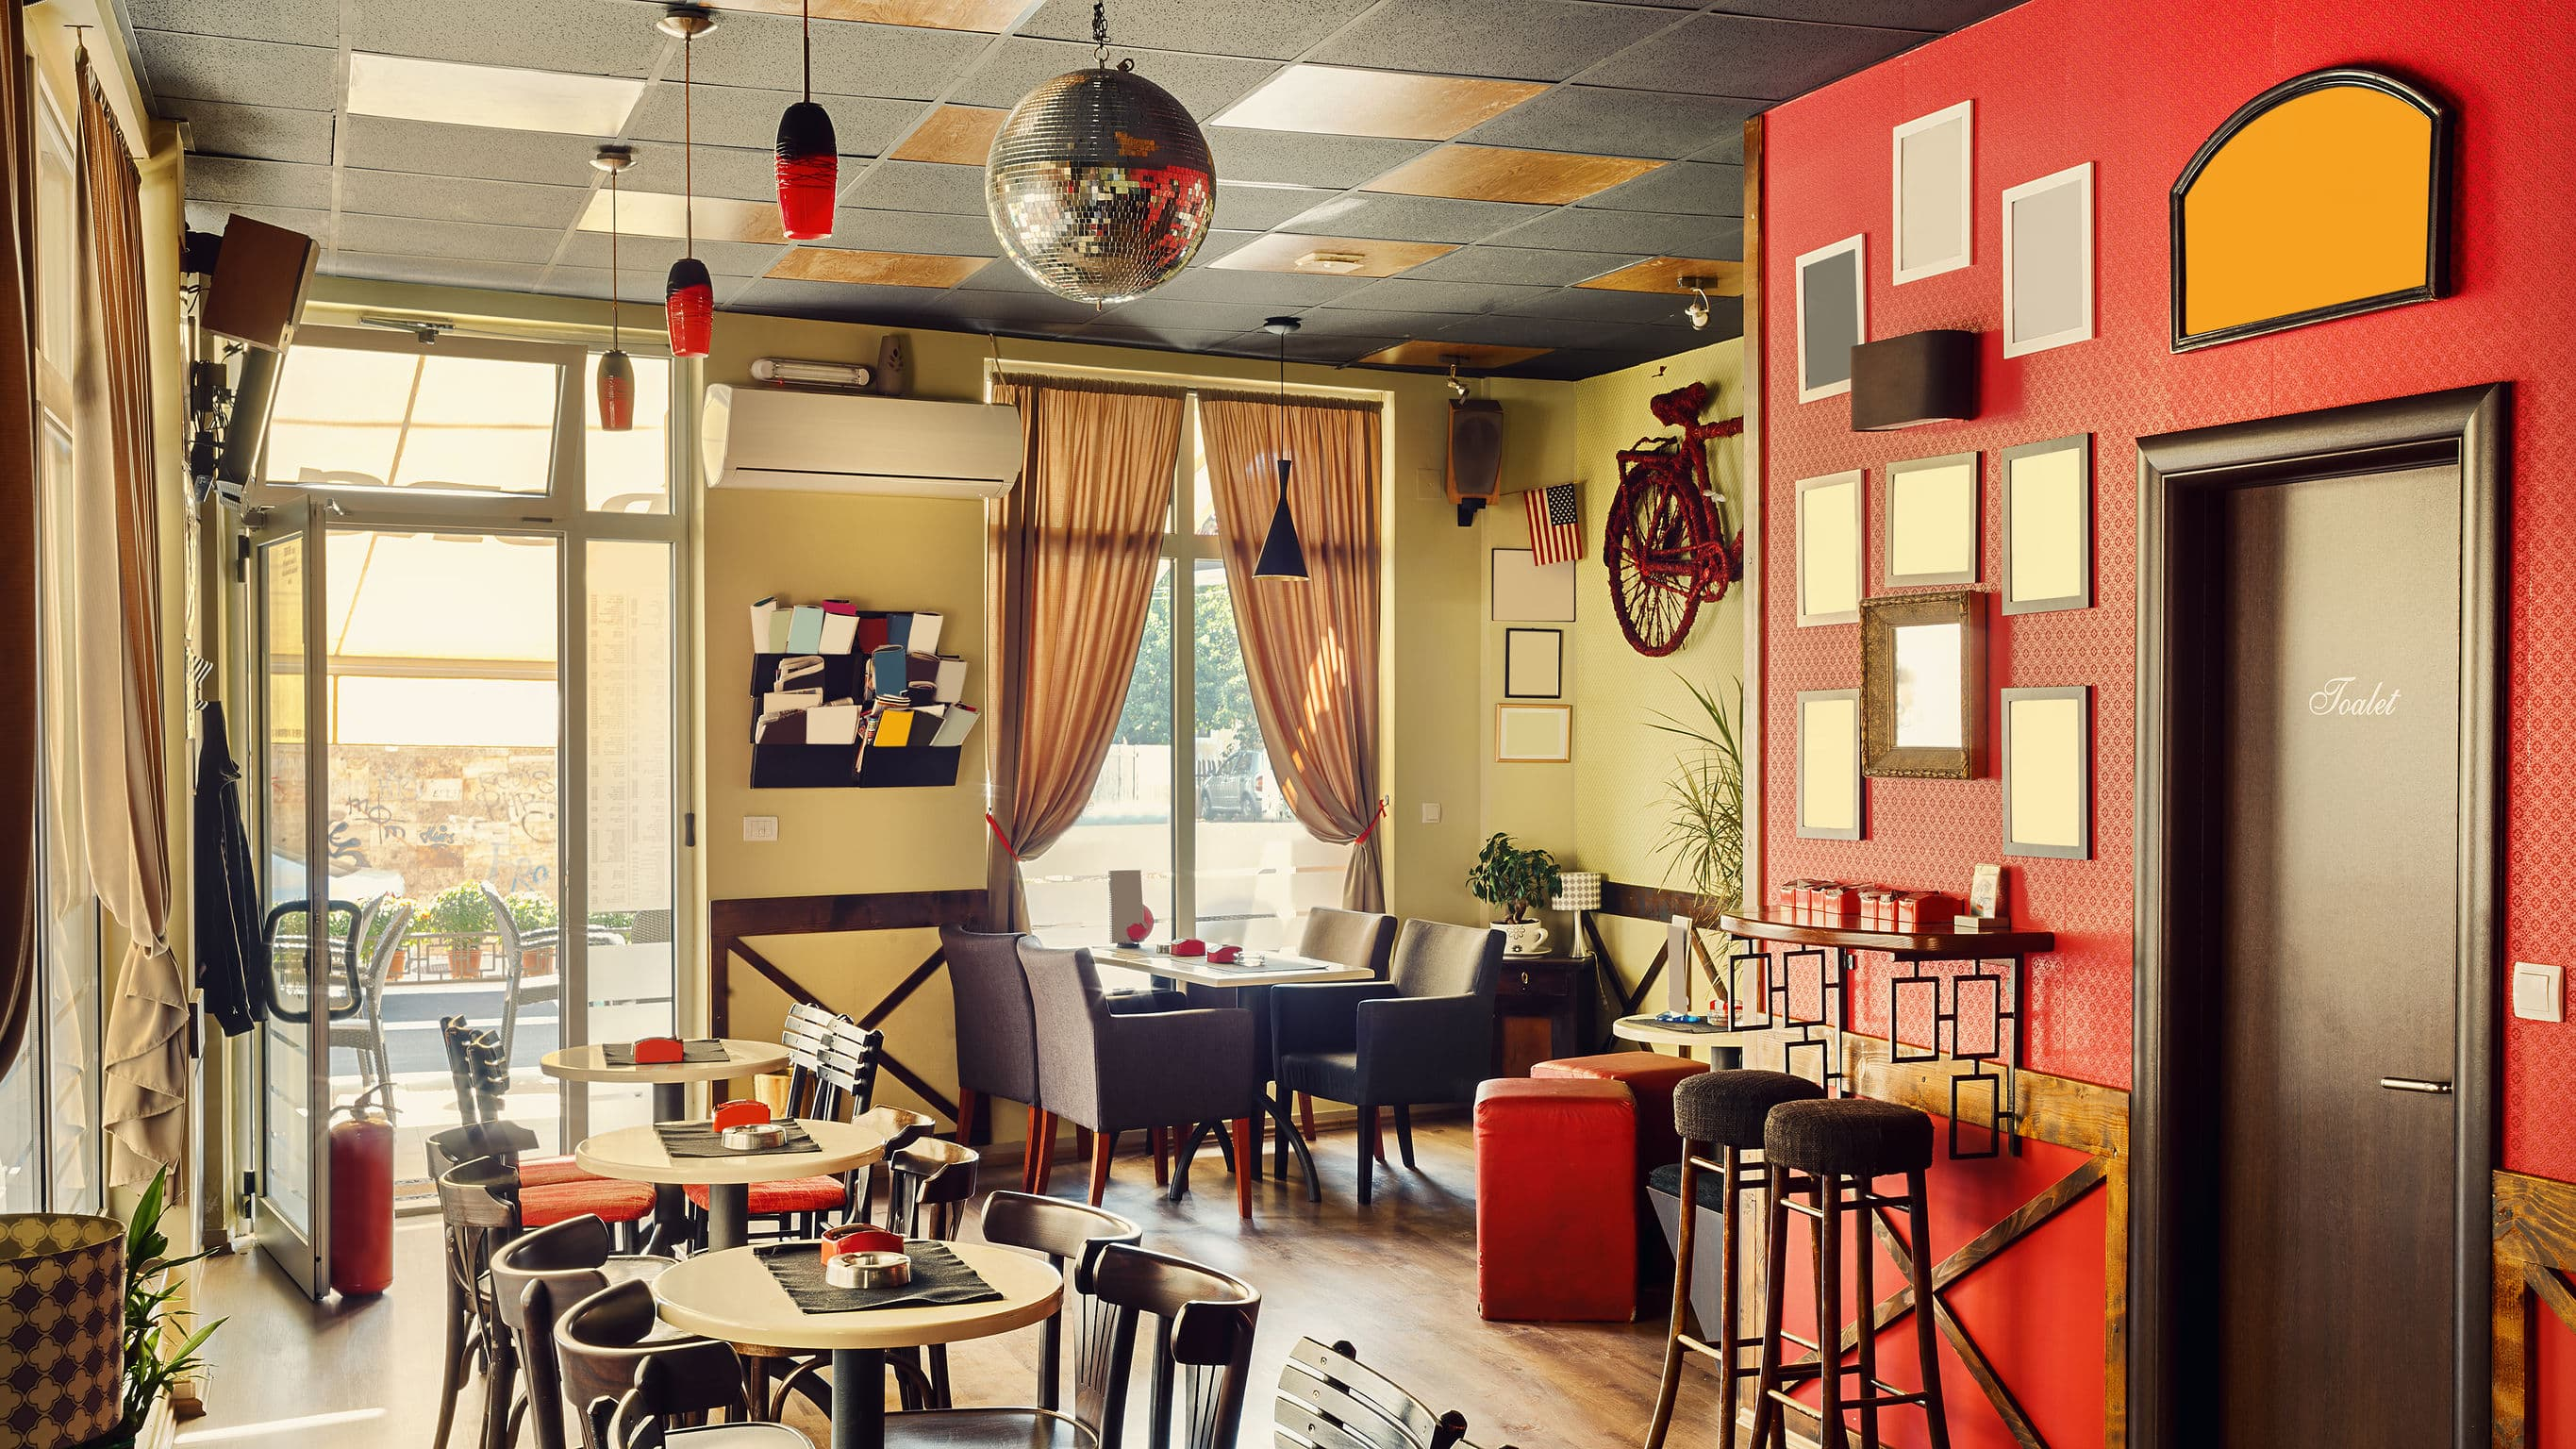 Antique Establishments Should Consider Purchasing Modern Restaurant Equipment